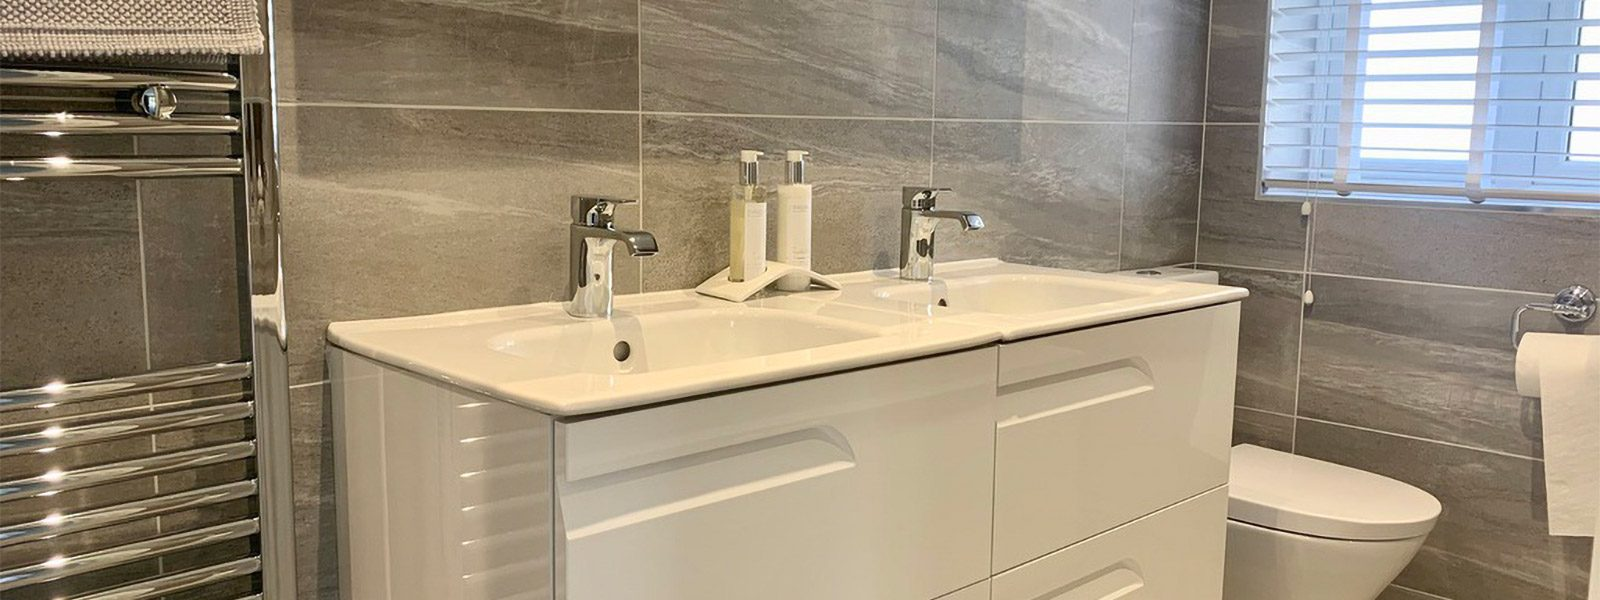 residential-bathroom-4-1600